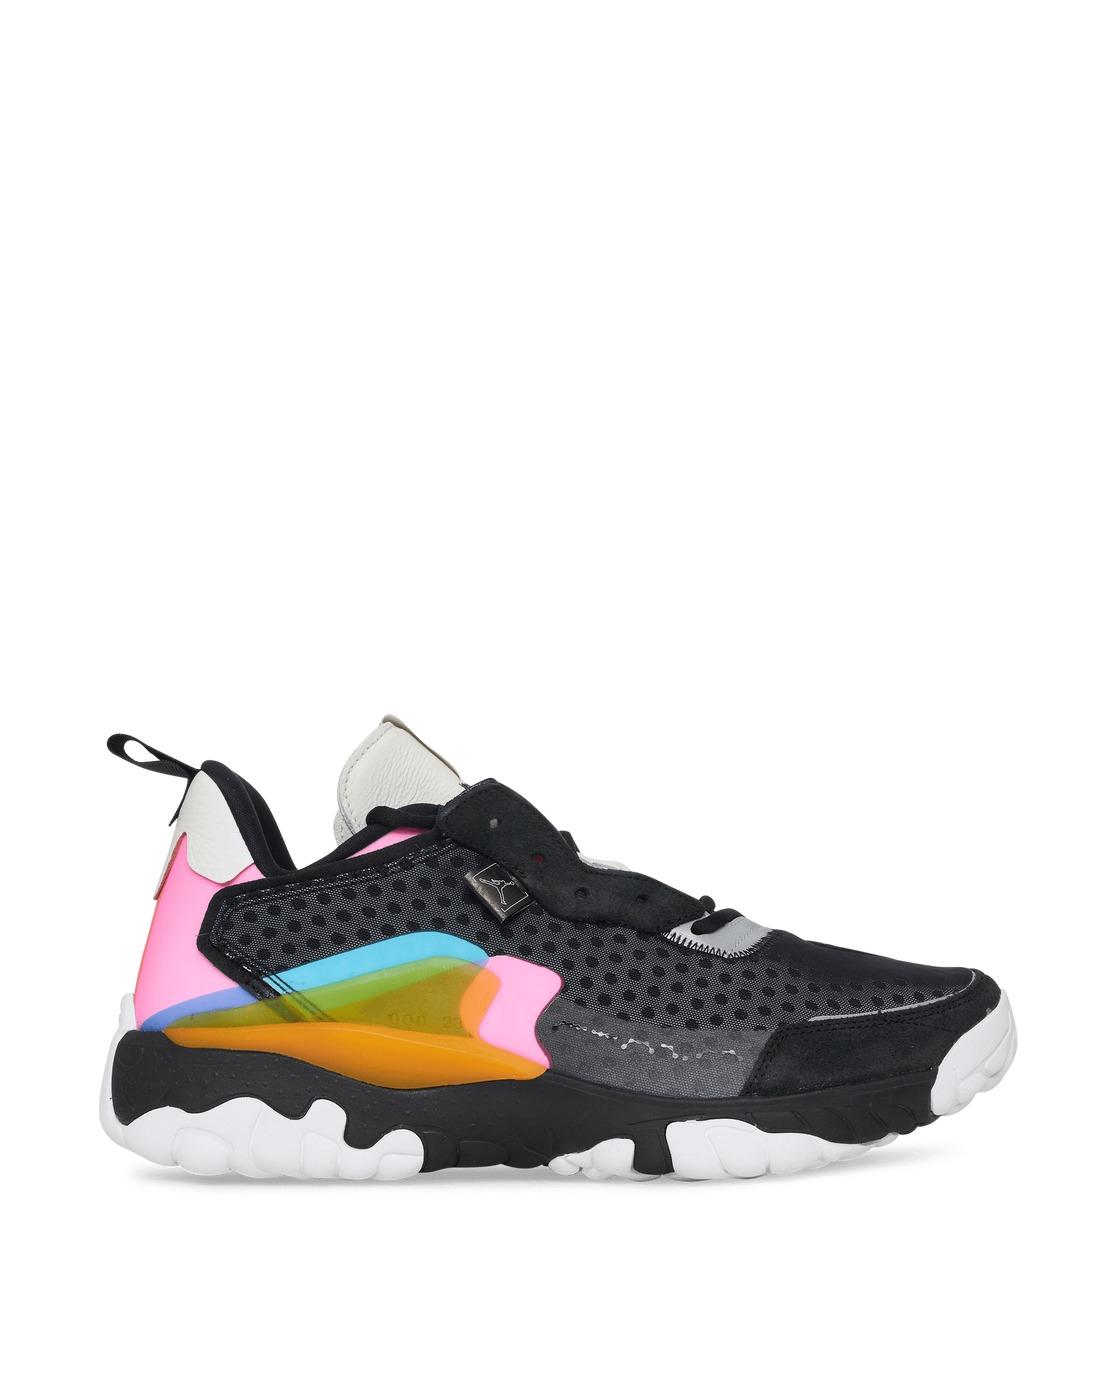 Photo: Nike Jordan Jordan Delta 2 Sp Sneakers Black/White